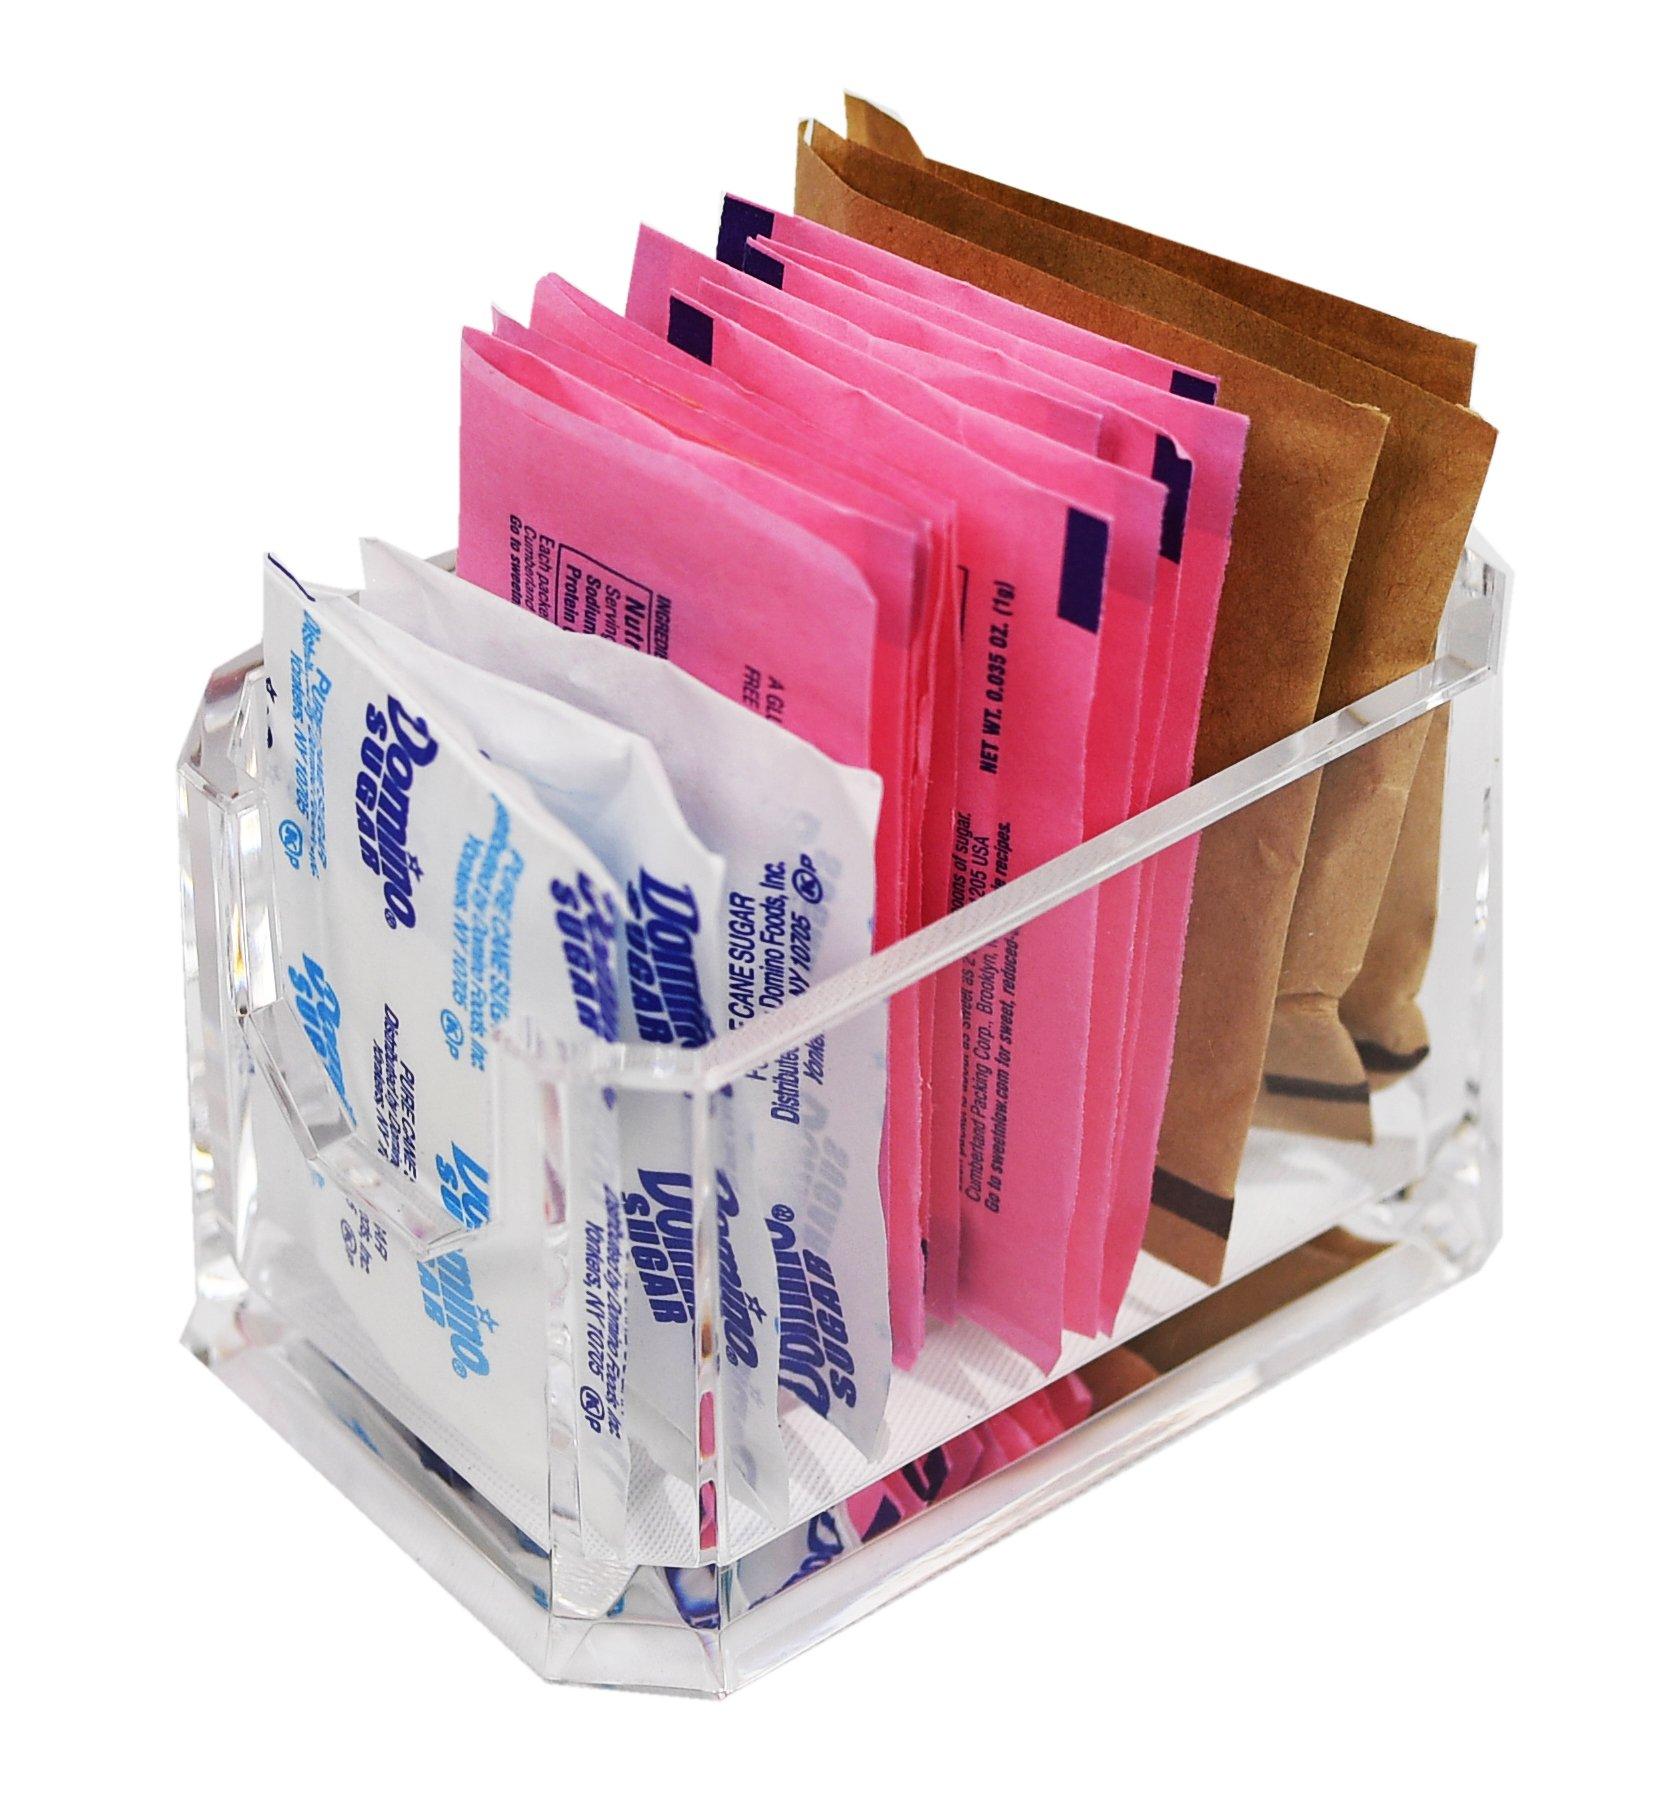 ARAD Crystal Clear Restaurant Style Acrylic Sweetener, Sugar, Sweet 'N Low Holder 24 Packet Capacity